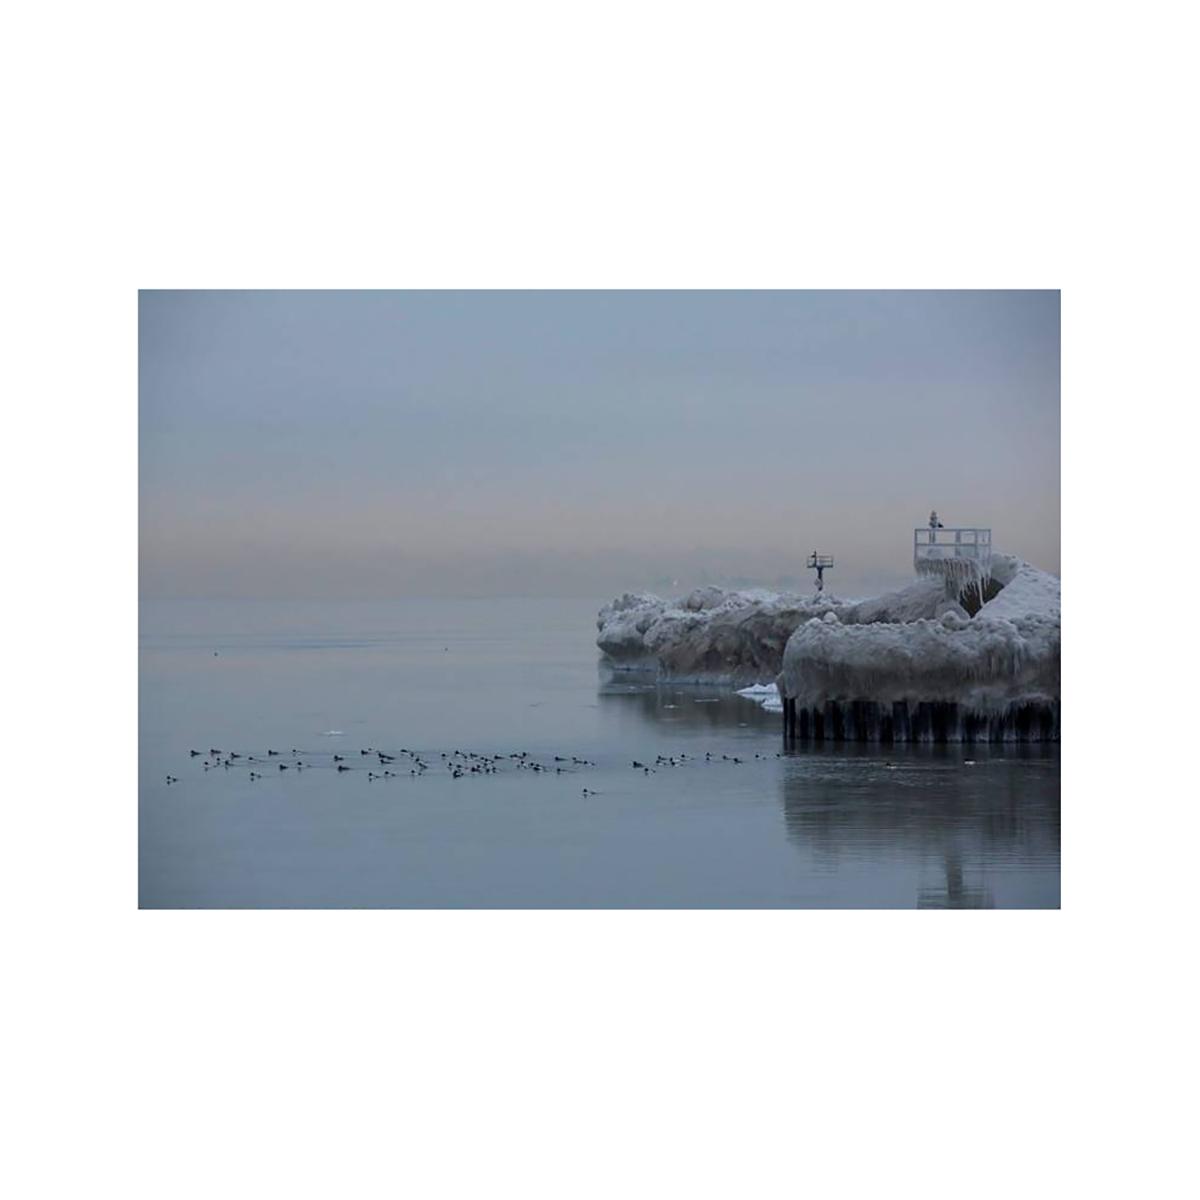 Ducks on Frozen Lake Michigan Photograph